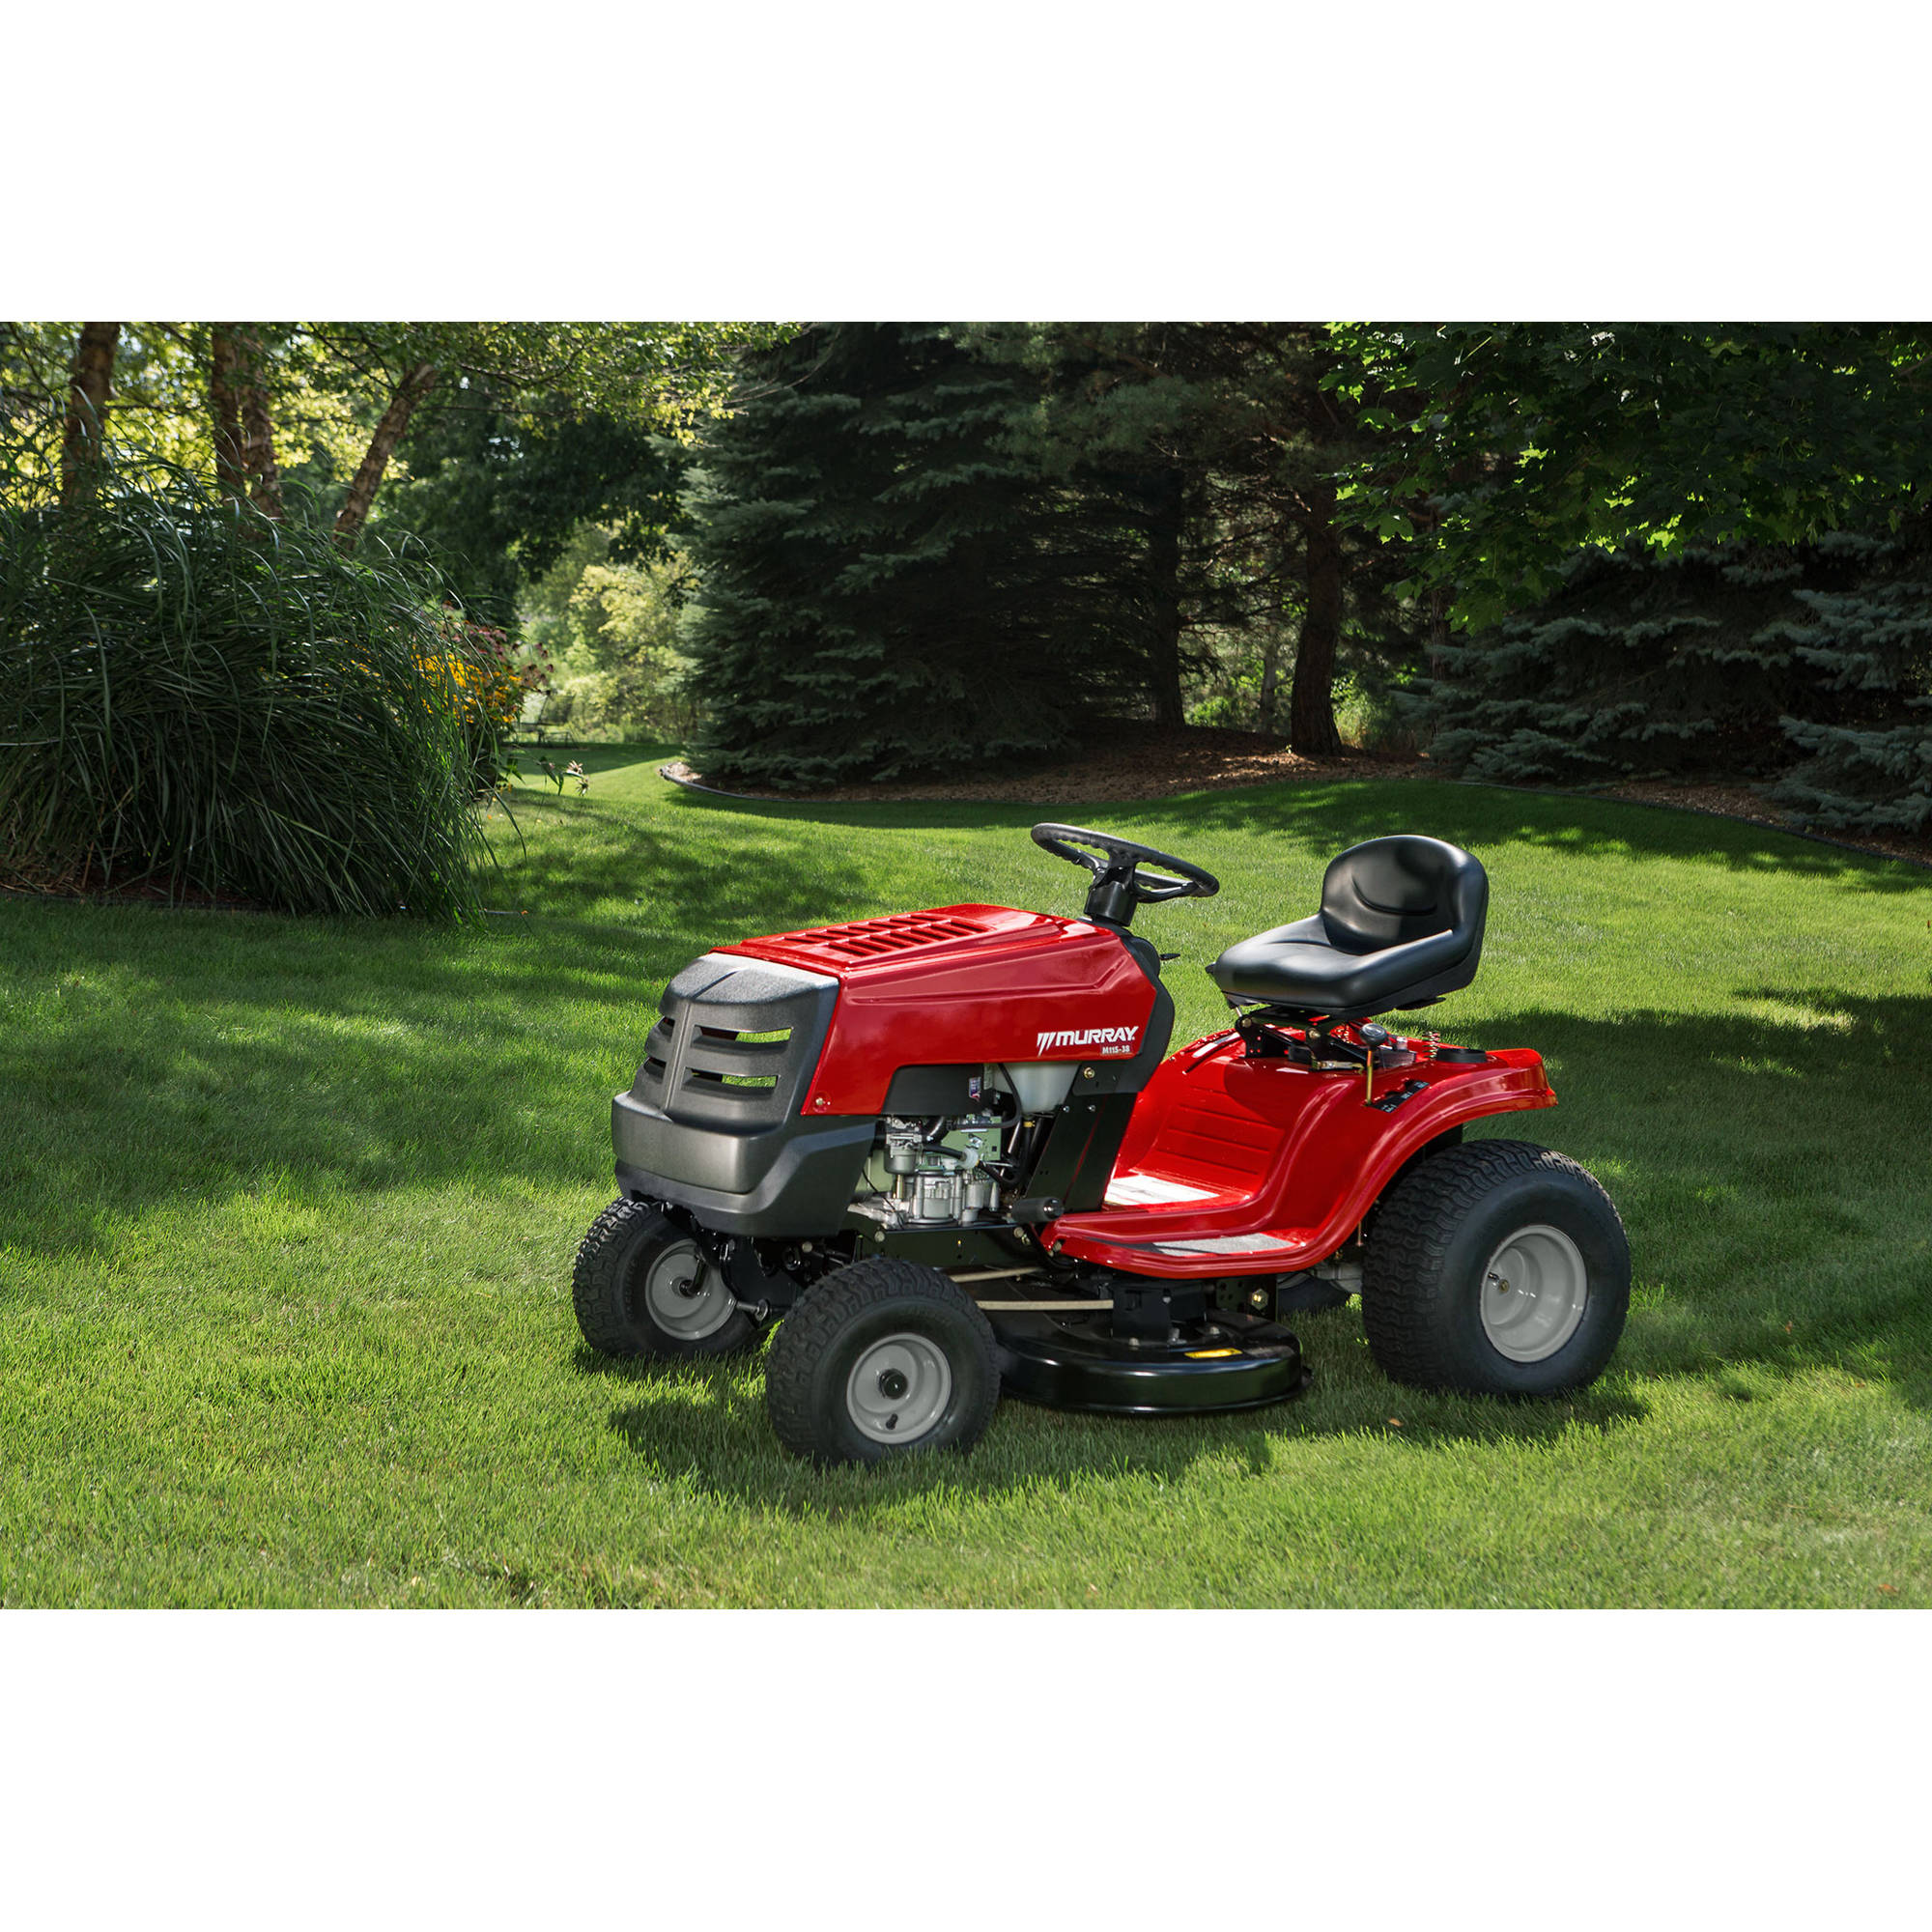 "murray 13ac77lf058 38"" 11 5 hp riding mower walmart"